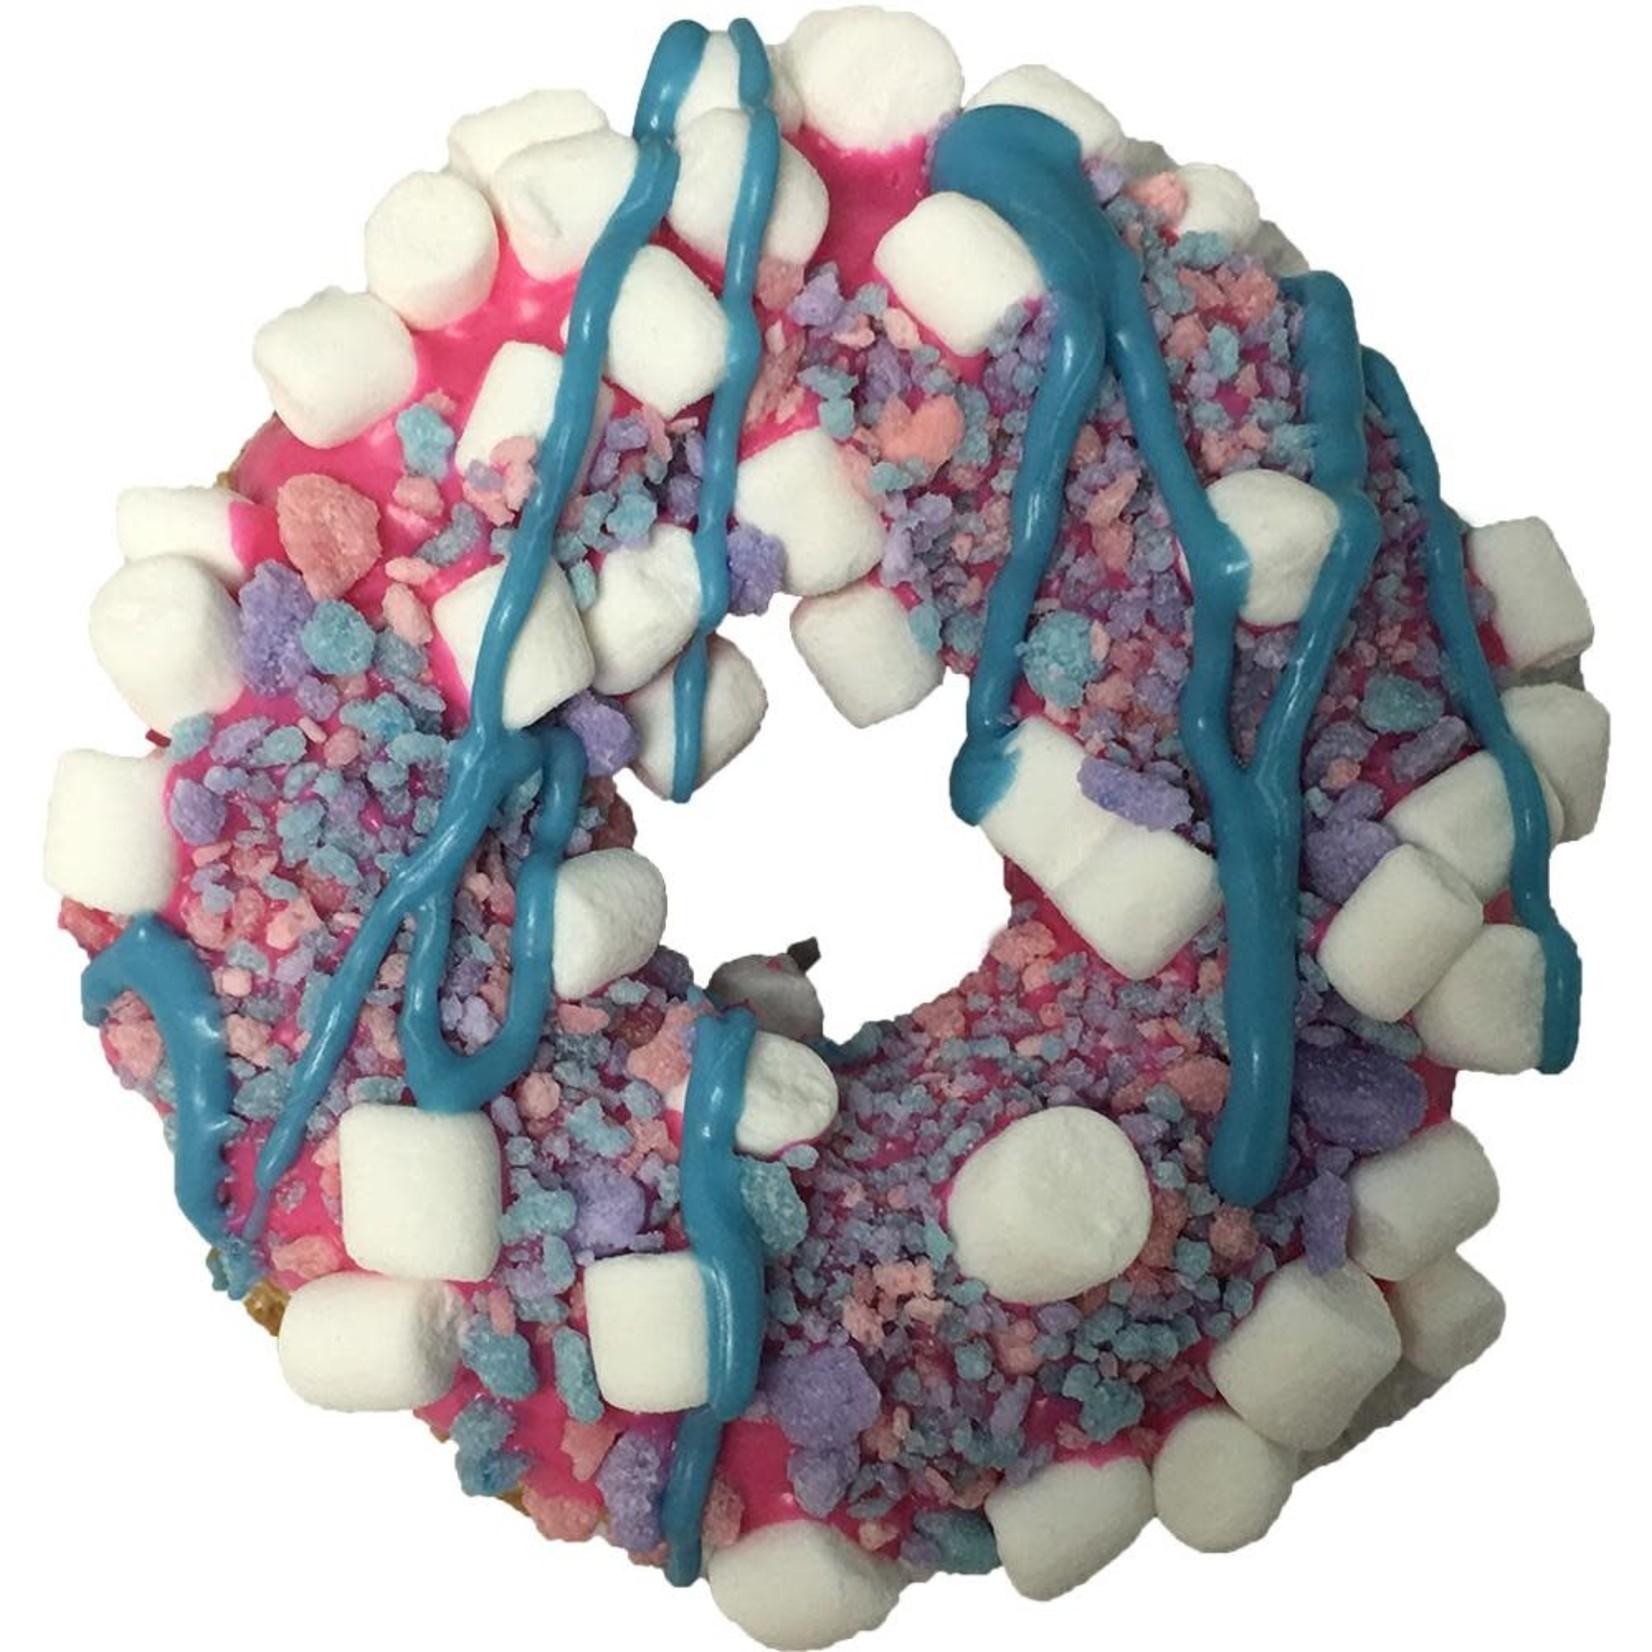 K9 Granola Factory K9GF Gourmet Granola Donut Cotton Candy Dog Treat